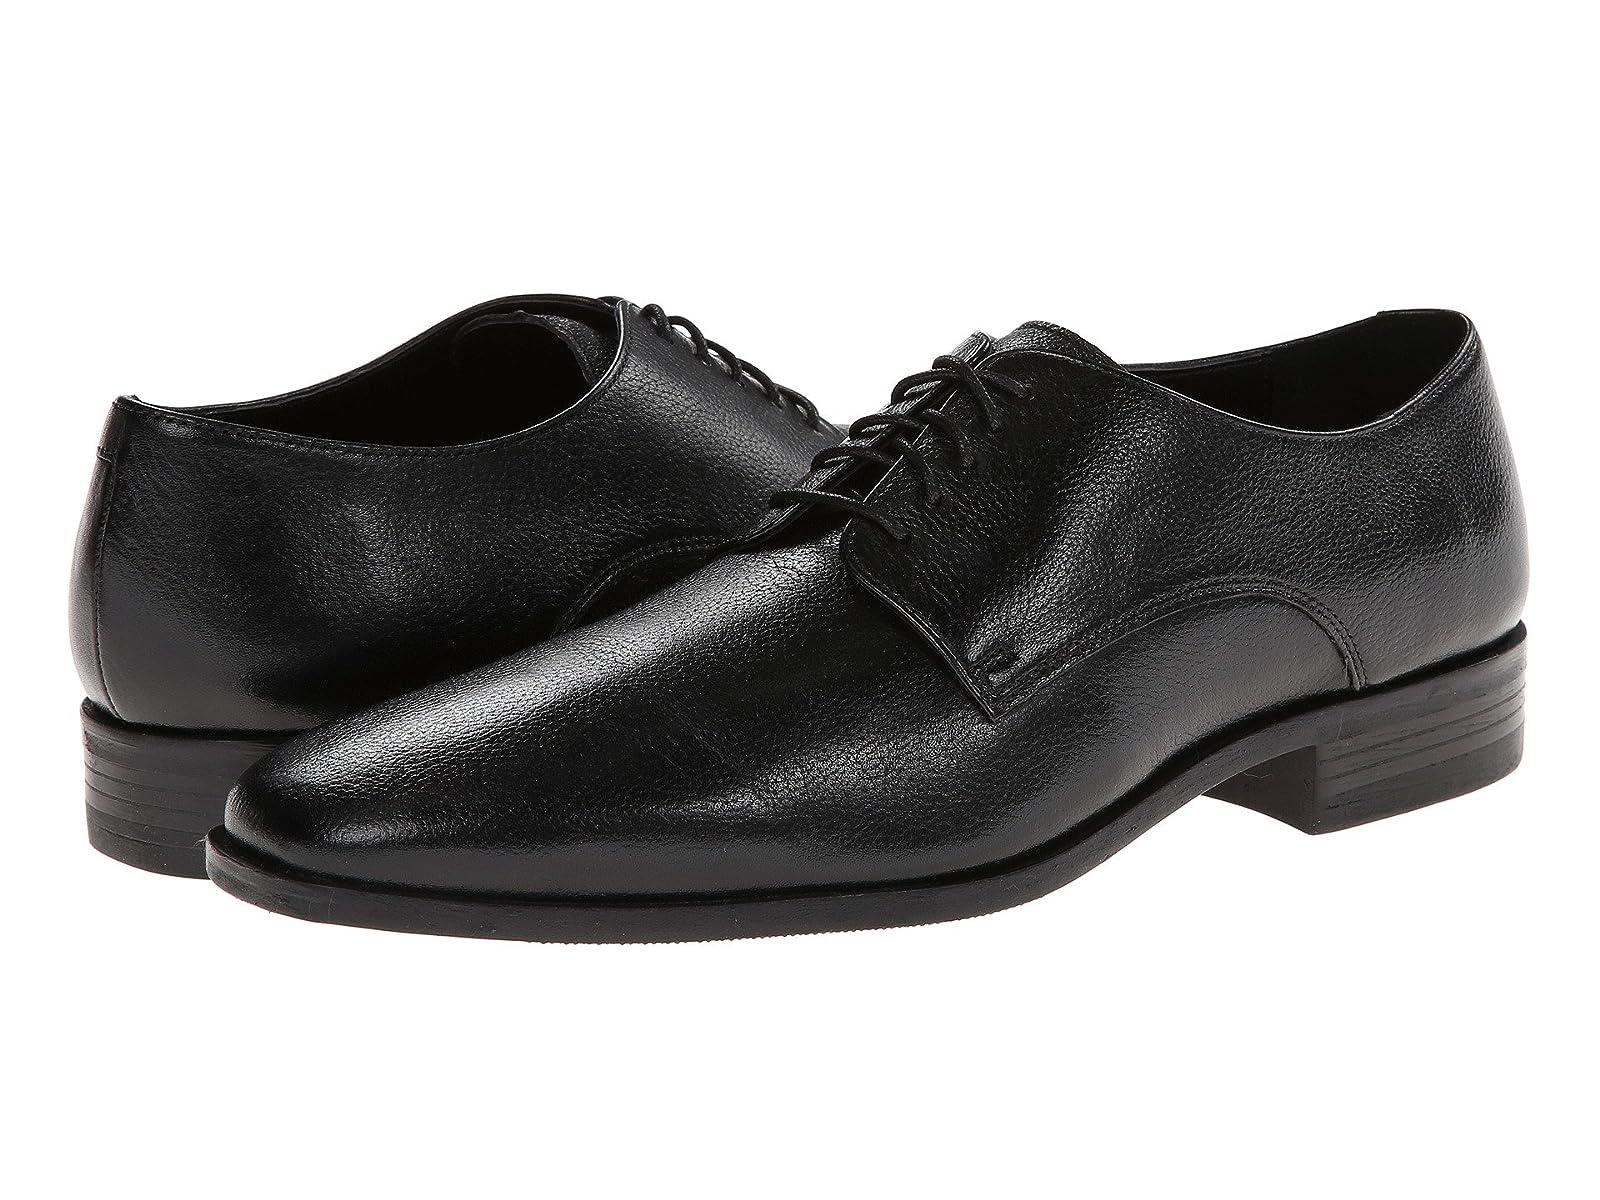 Cole Haan Kilgore Plain ToeCheap and distinctive eye-catching shoes